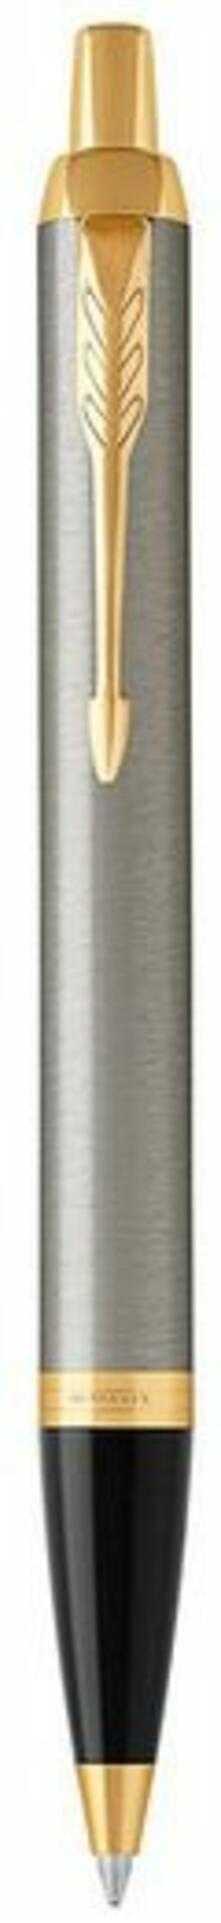 Parker IM Blu Clip-on retractable ballpoint pen 1 pezzo(i)